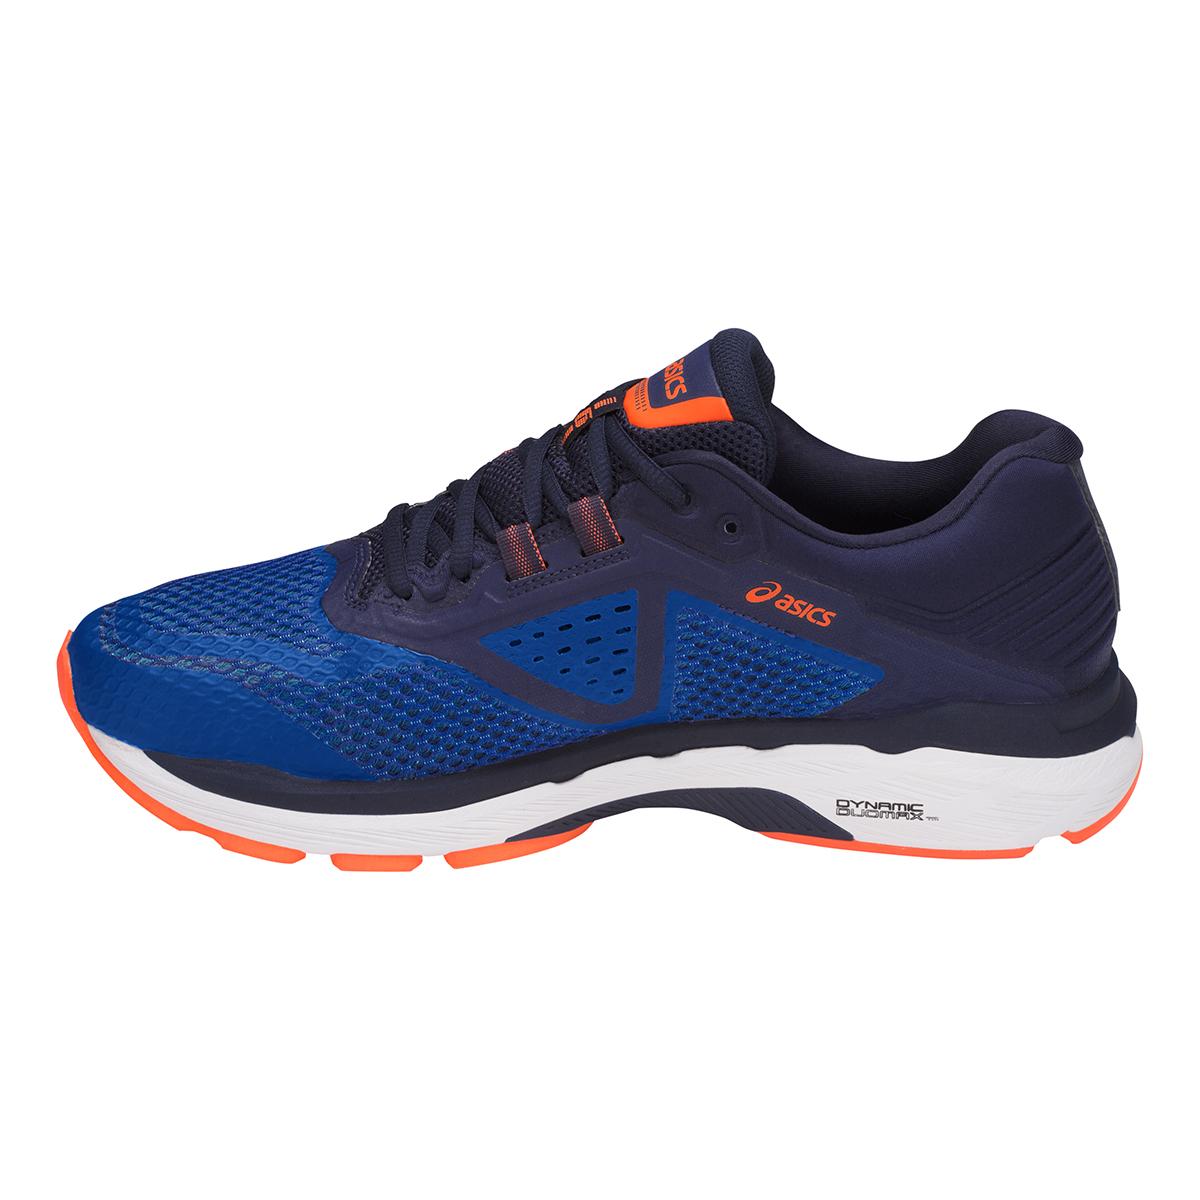 Men's Asics GT-2000 6 Running Shoe - Color: Imperial/Indigo (Regular Width) - Size: 10, Imperial/Indigo, large, image 2